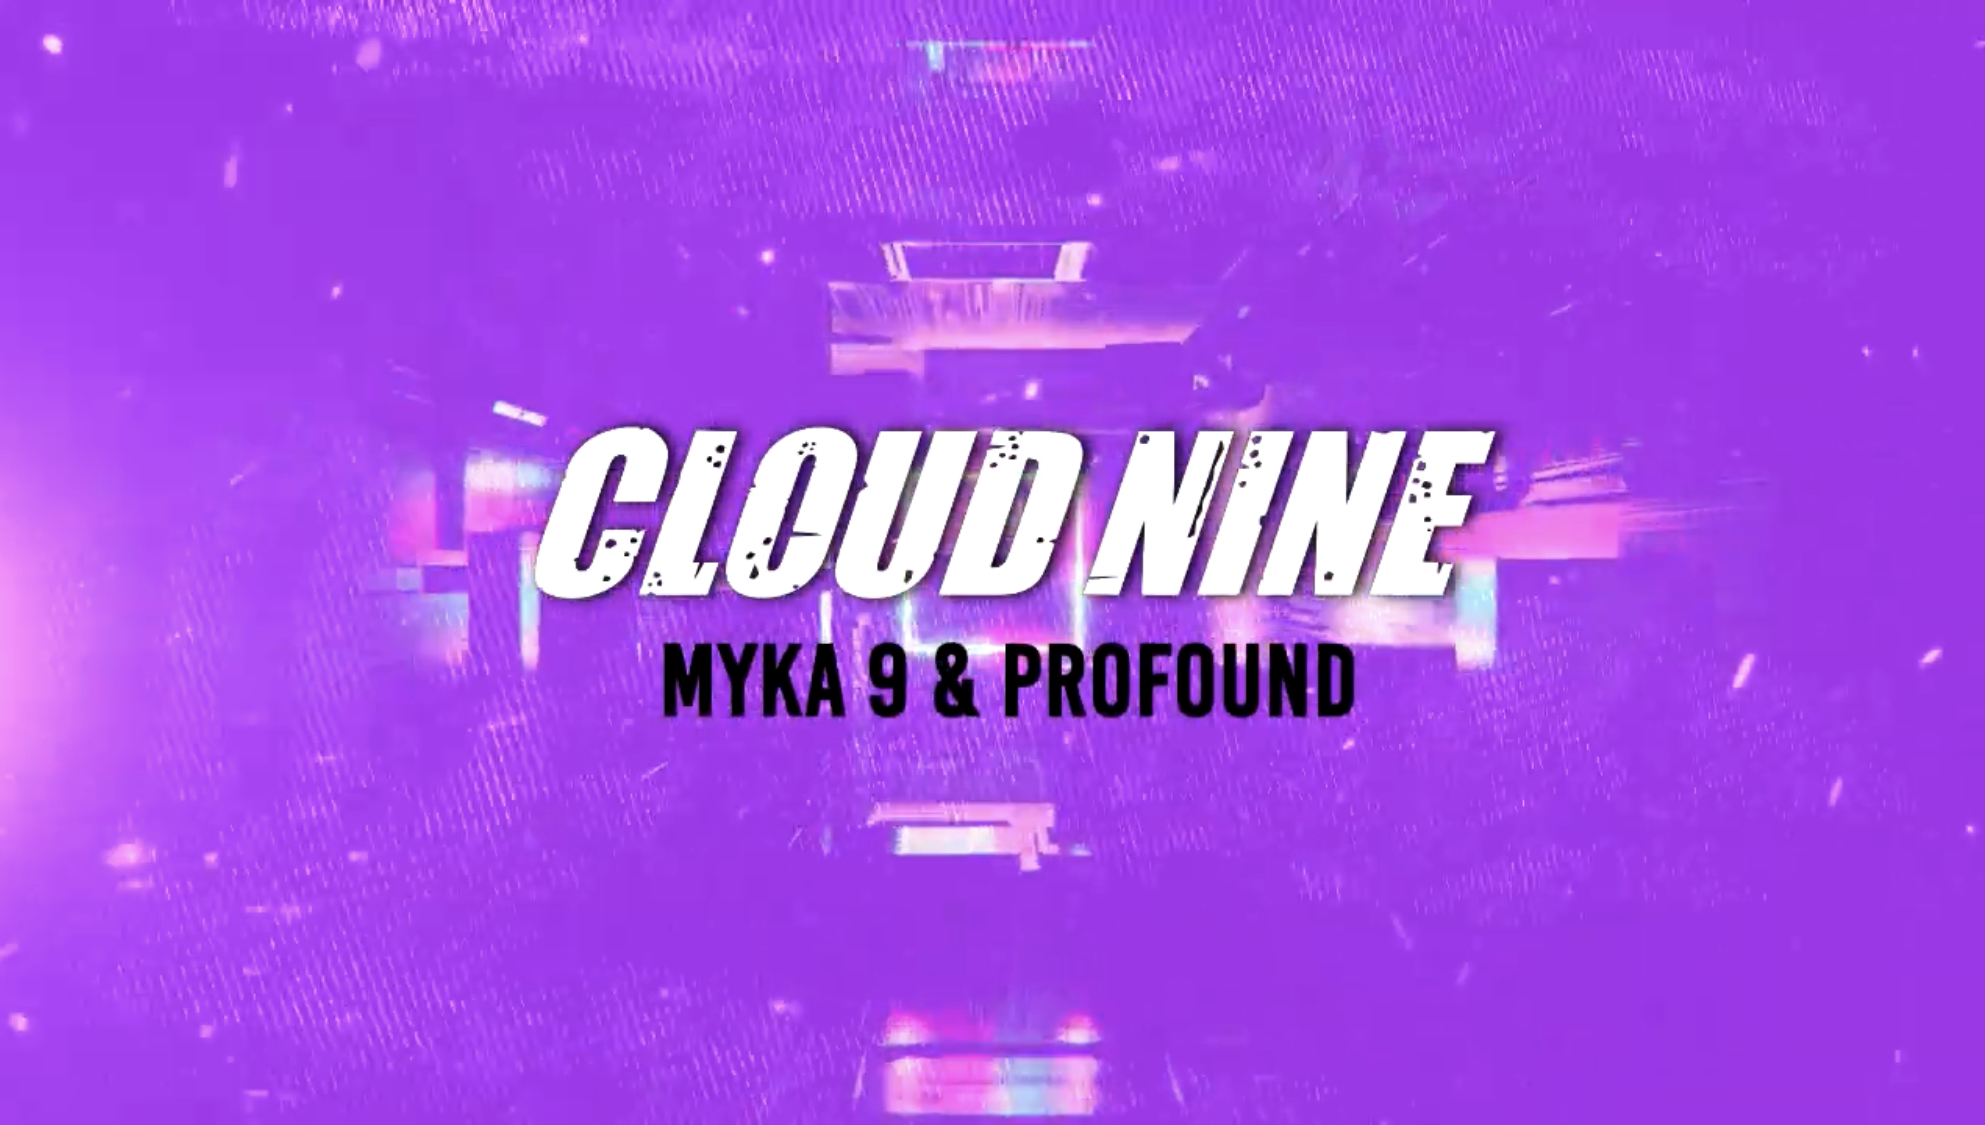 Myka 9 & Profound Beats - Cloud Nine | Lyric Video